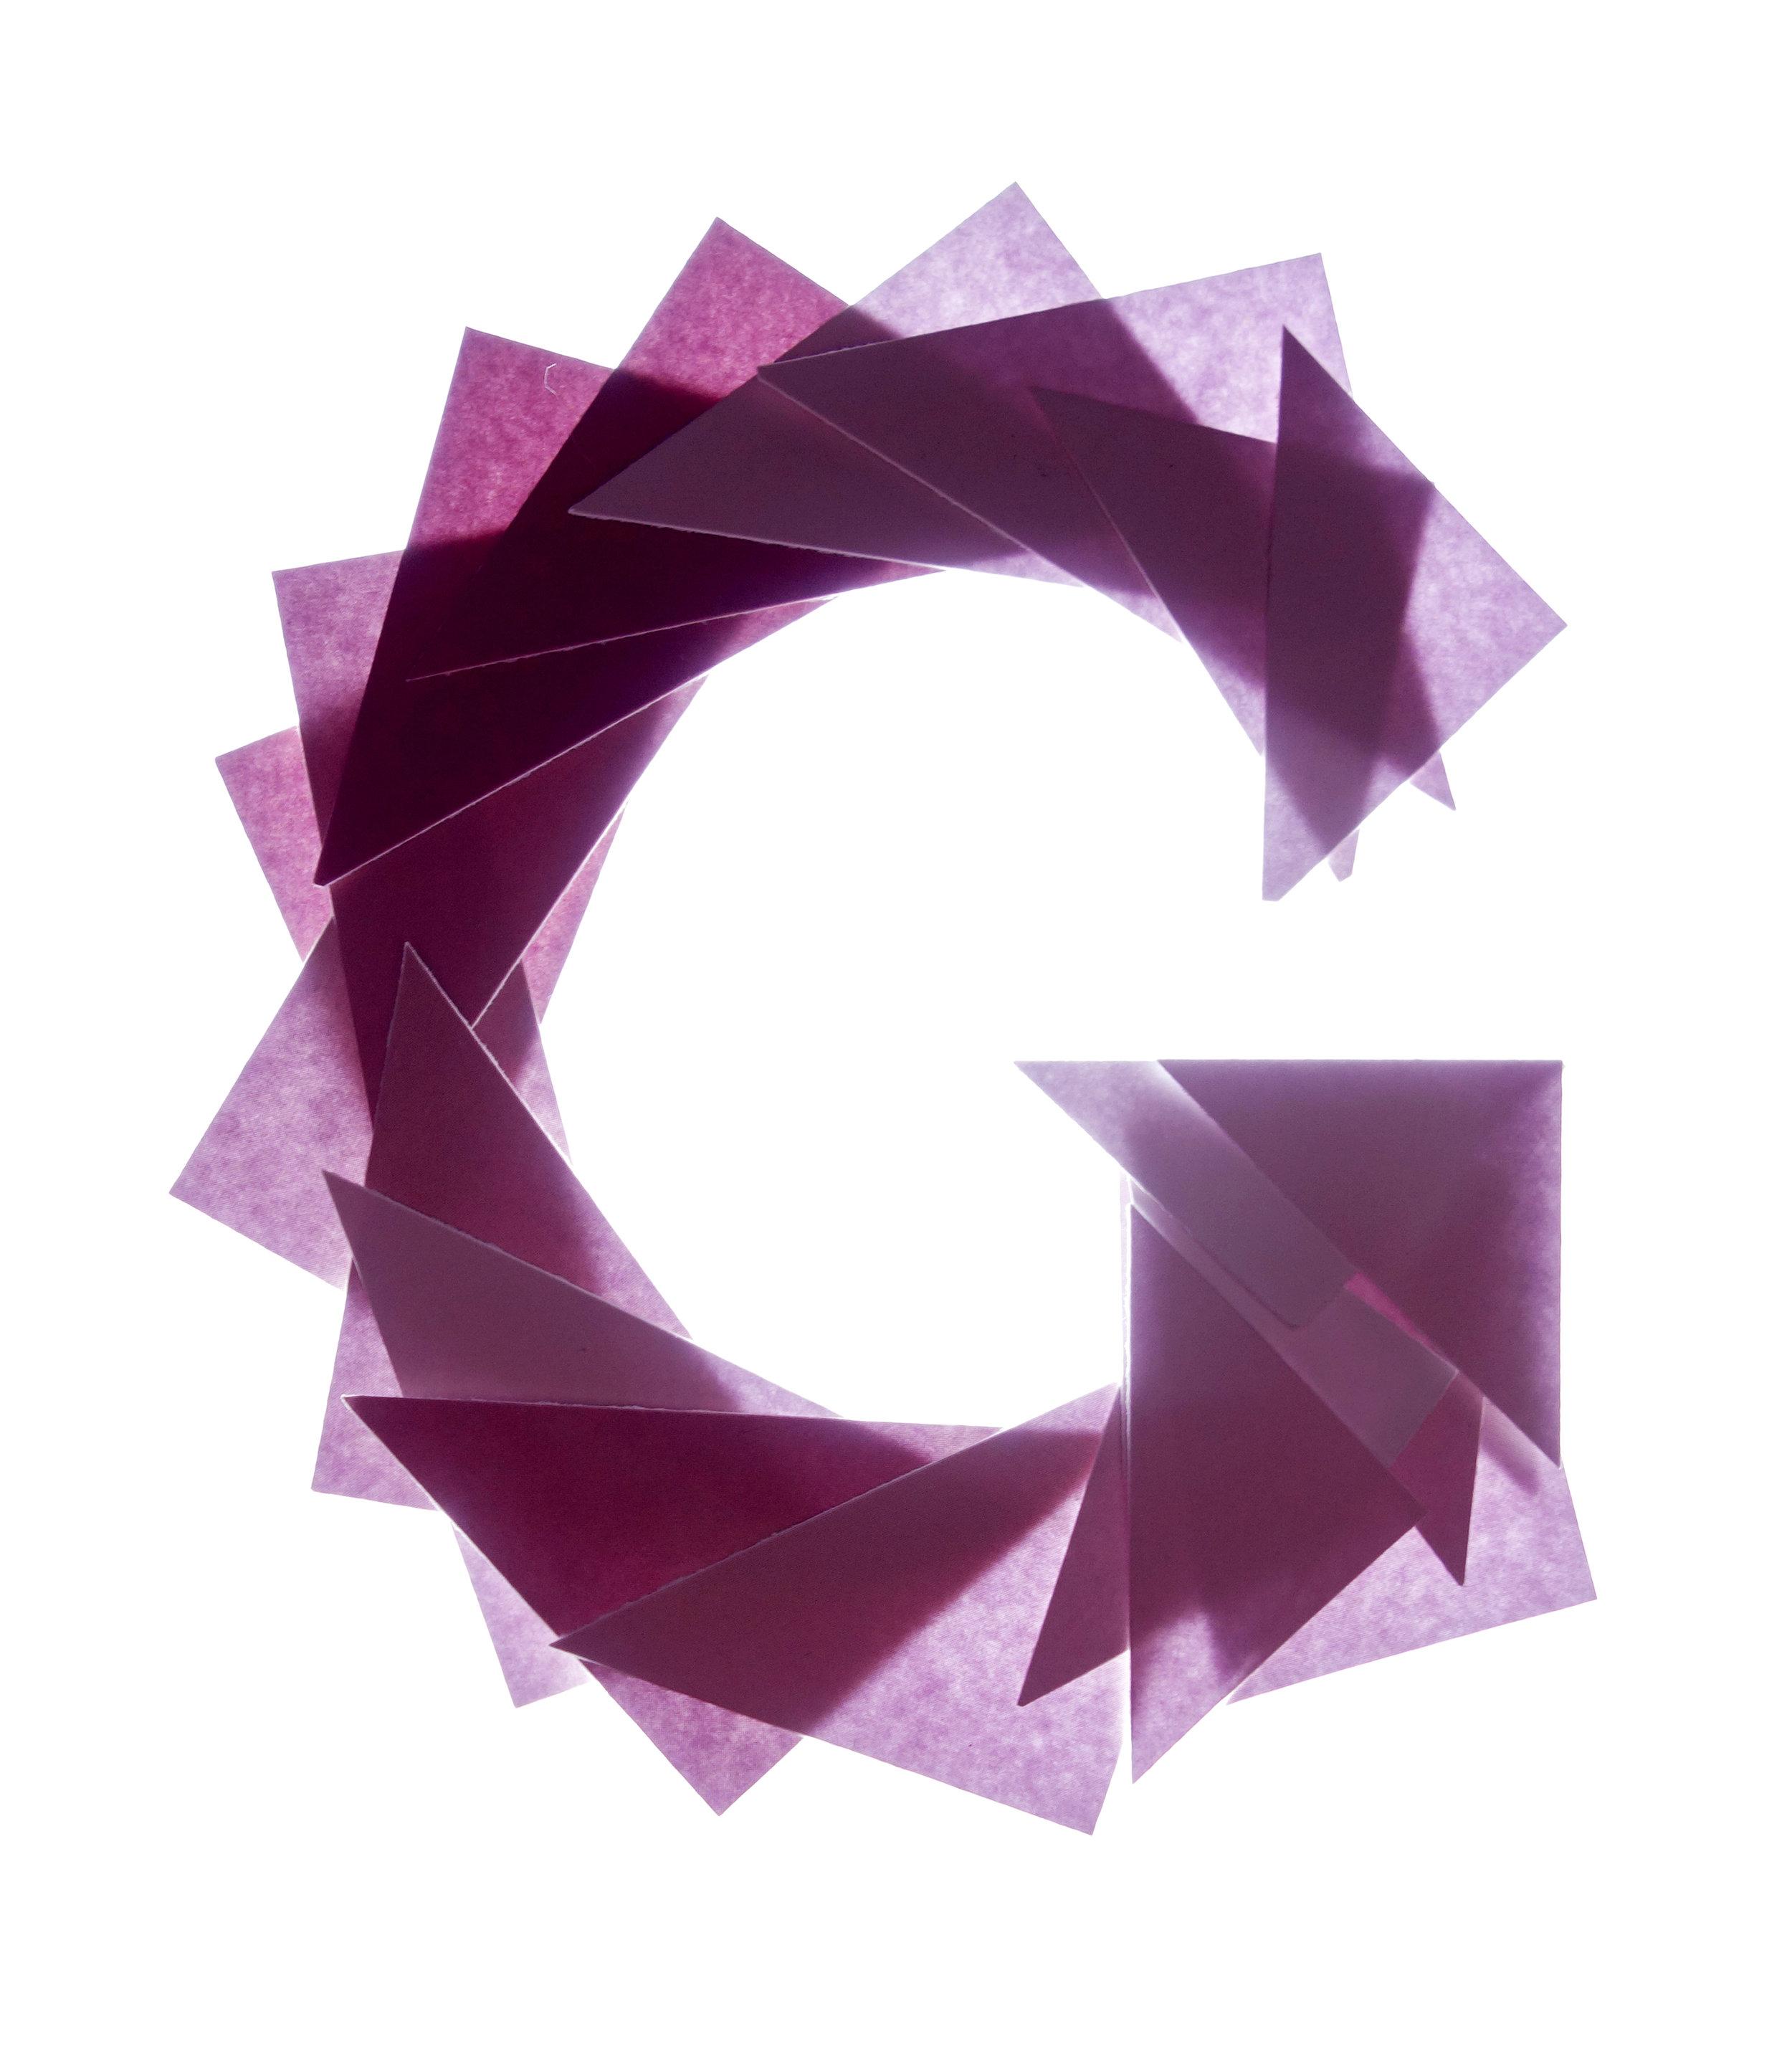 _G.jpg